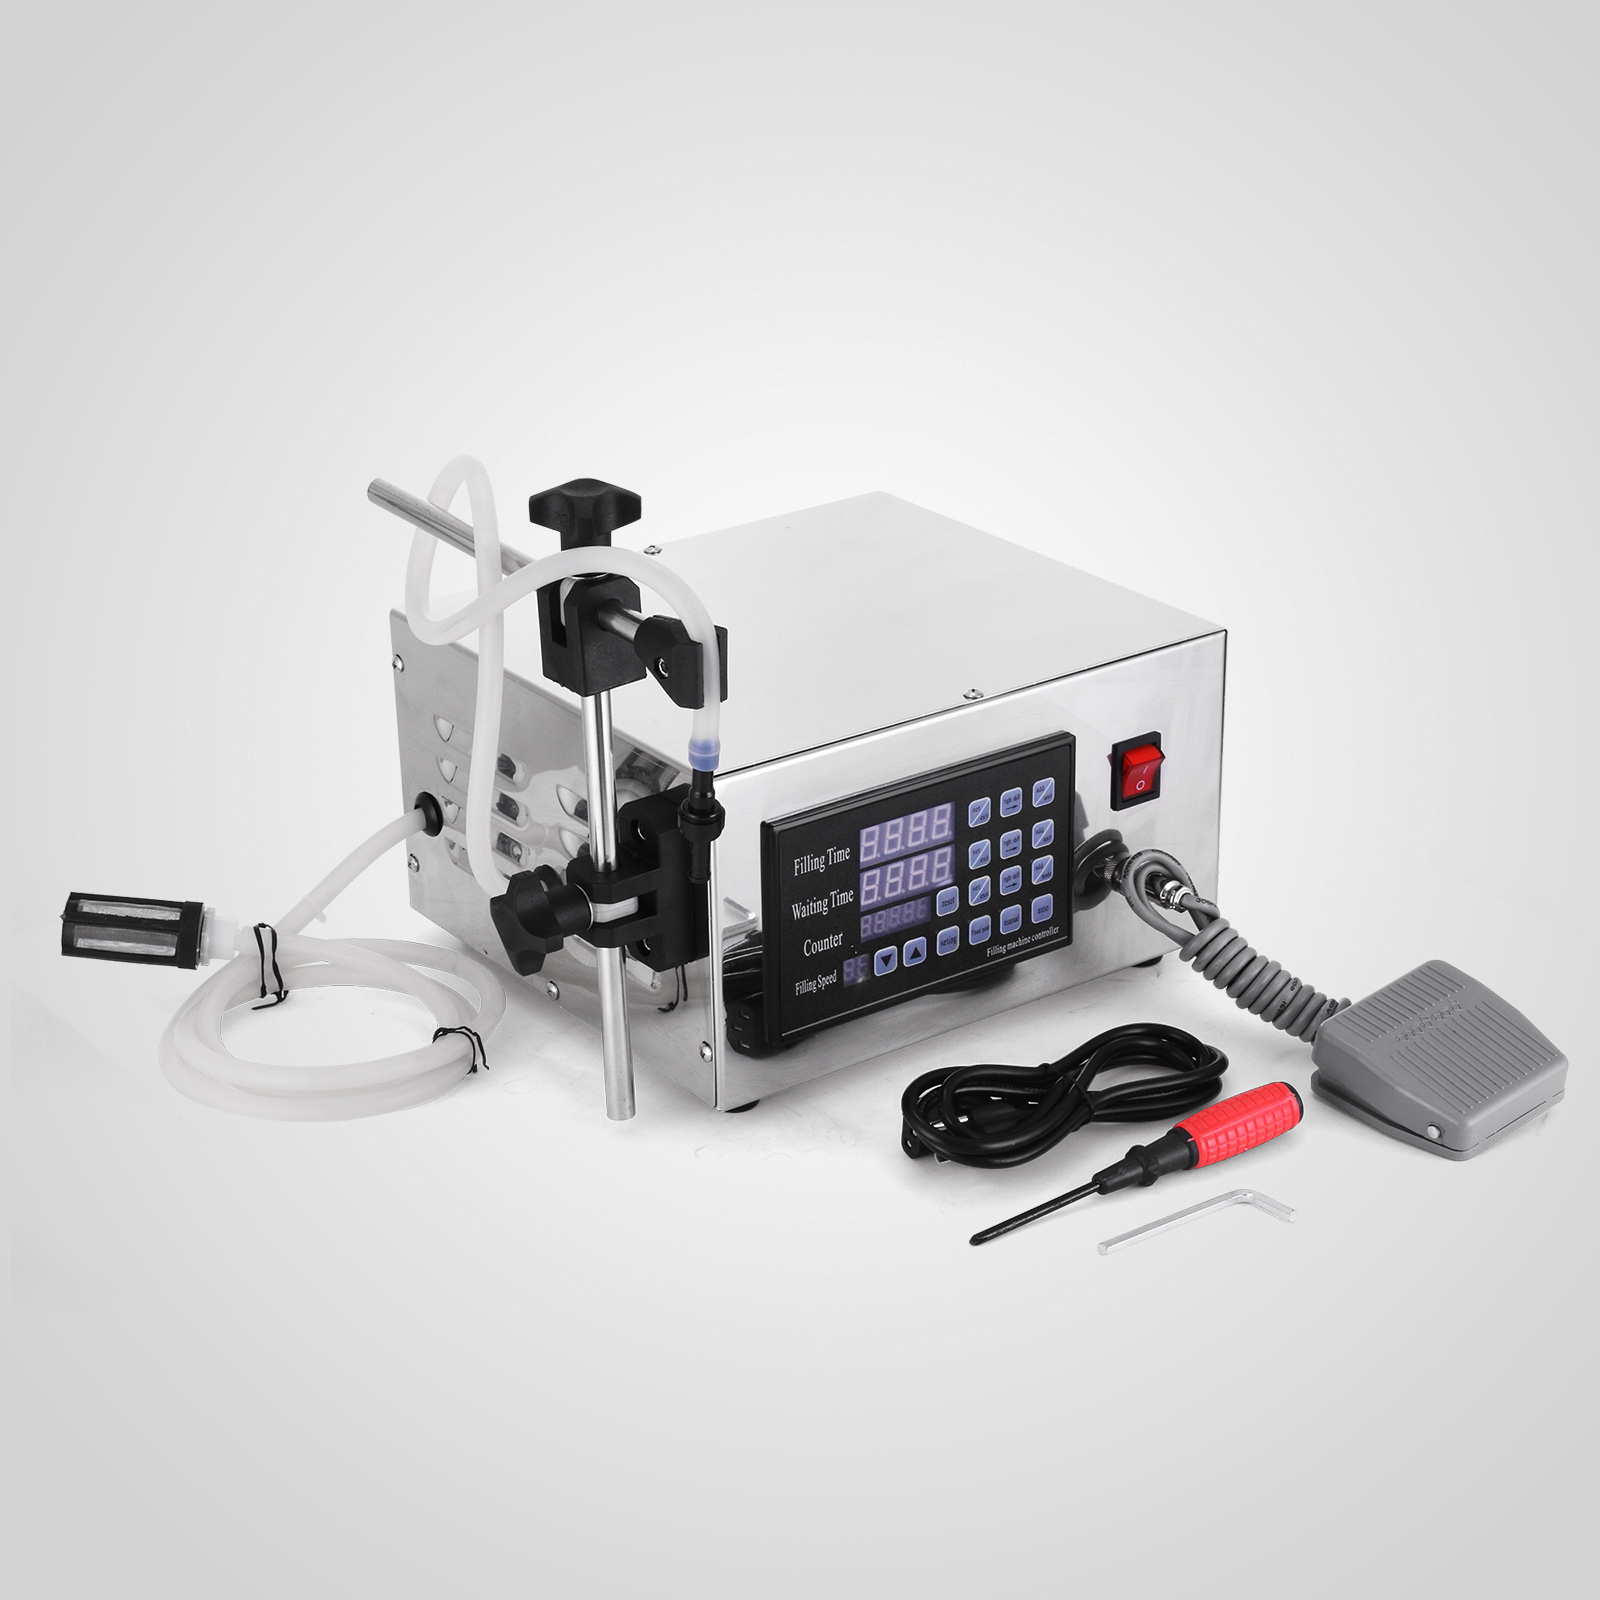 Liquid-Filling-Machine-Filler-Remplissage-2-3500ML-50-500ML-INDUSTRY-SUPPLY miniature 39